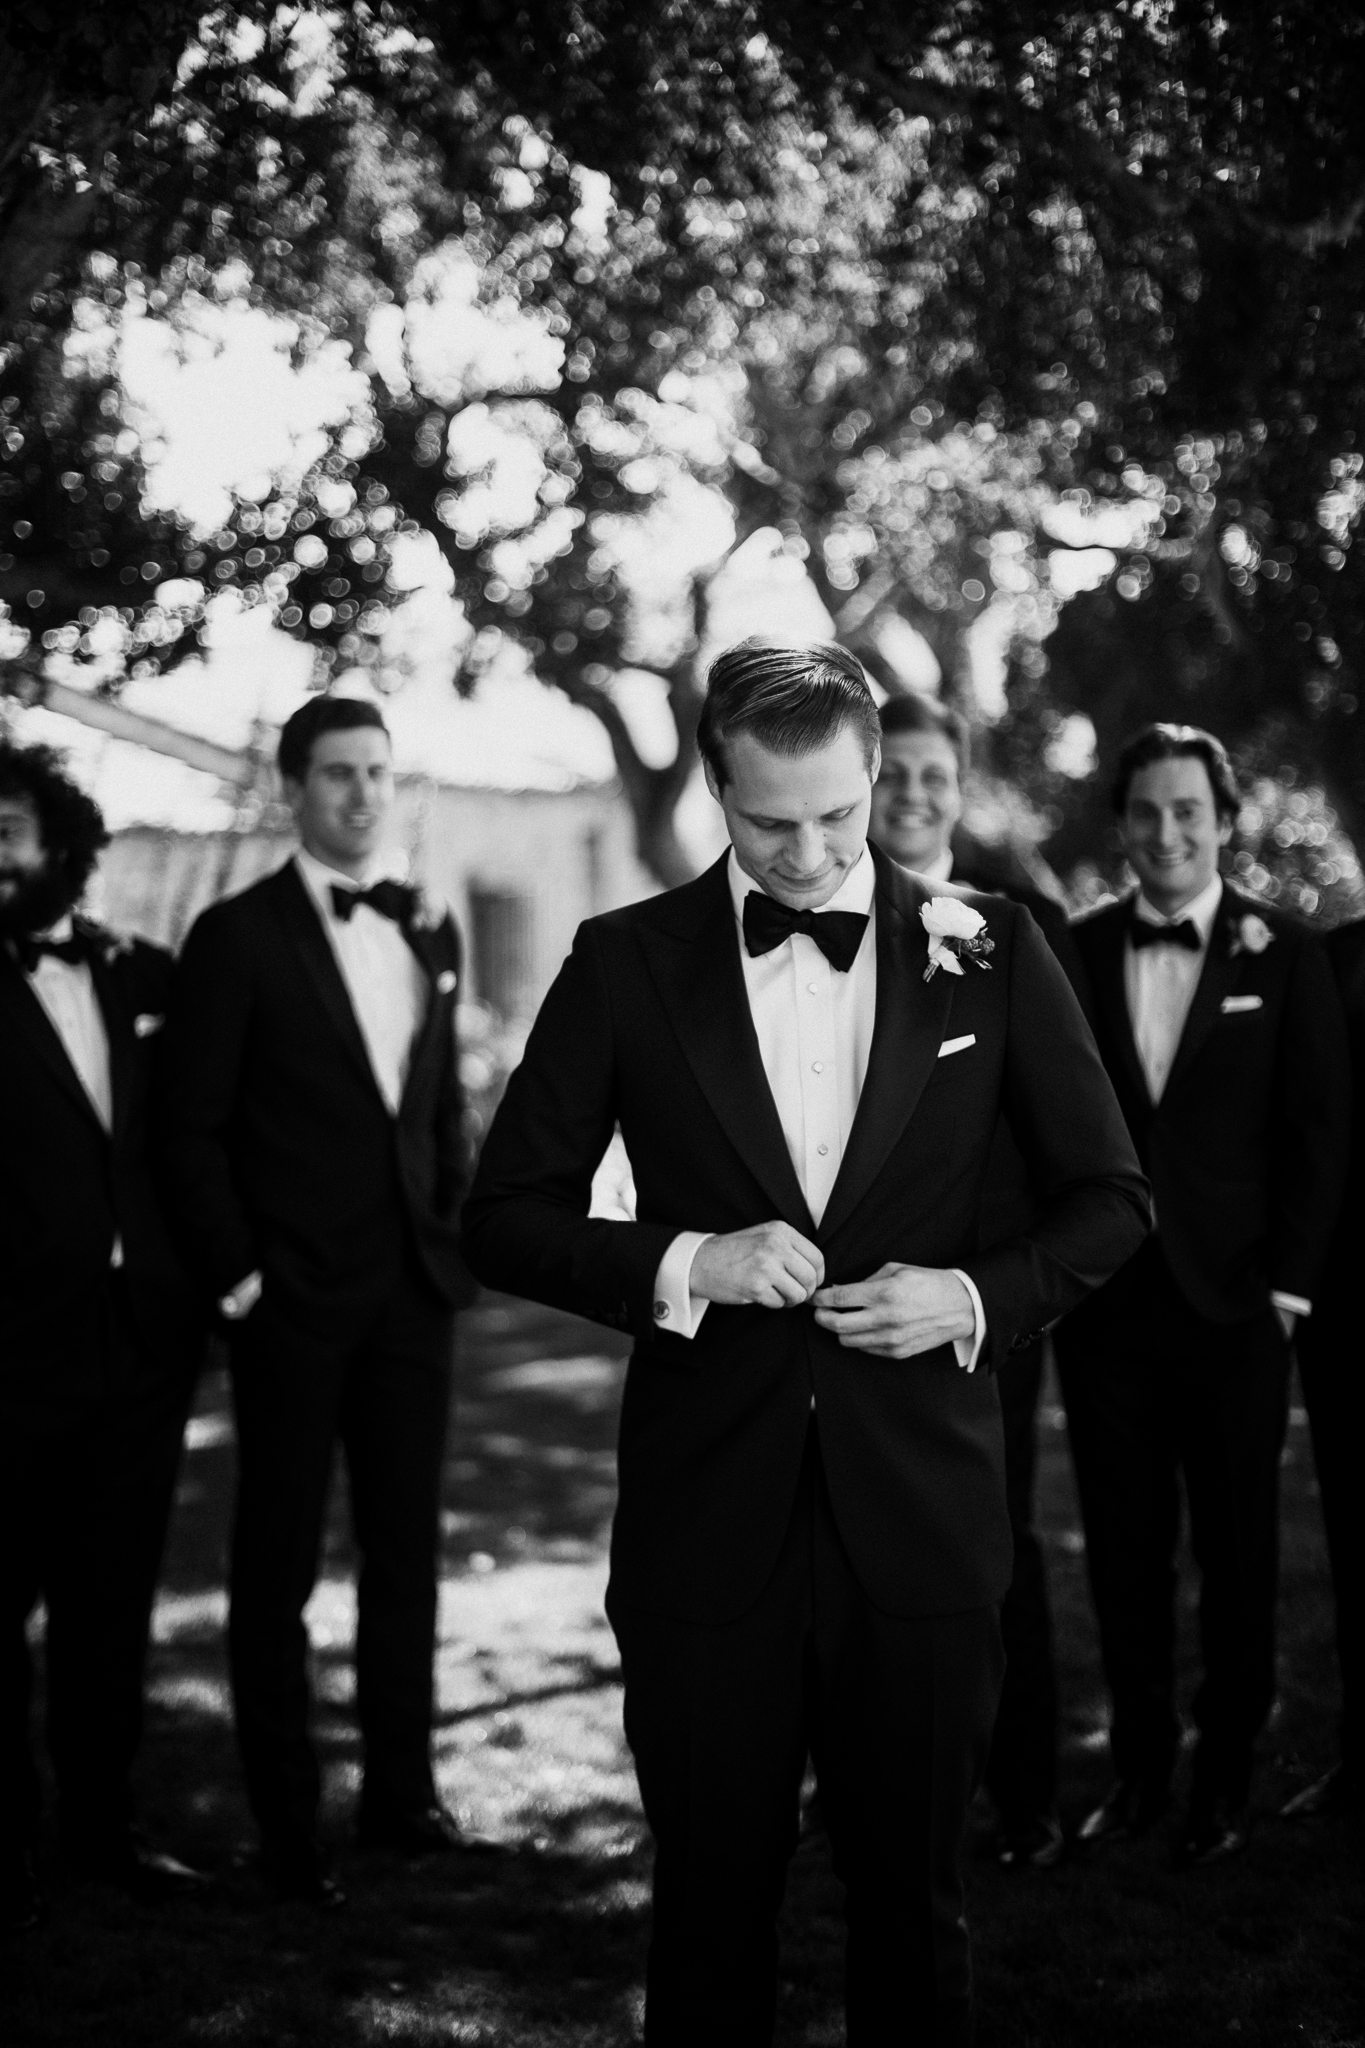 Archer Inspired Photography Carmel California Wedding Lifestyle Documentary Photographer Bride and Groom-14.jpg